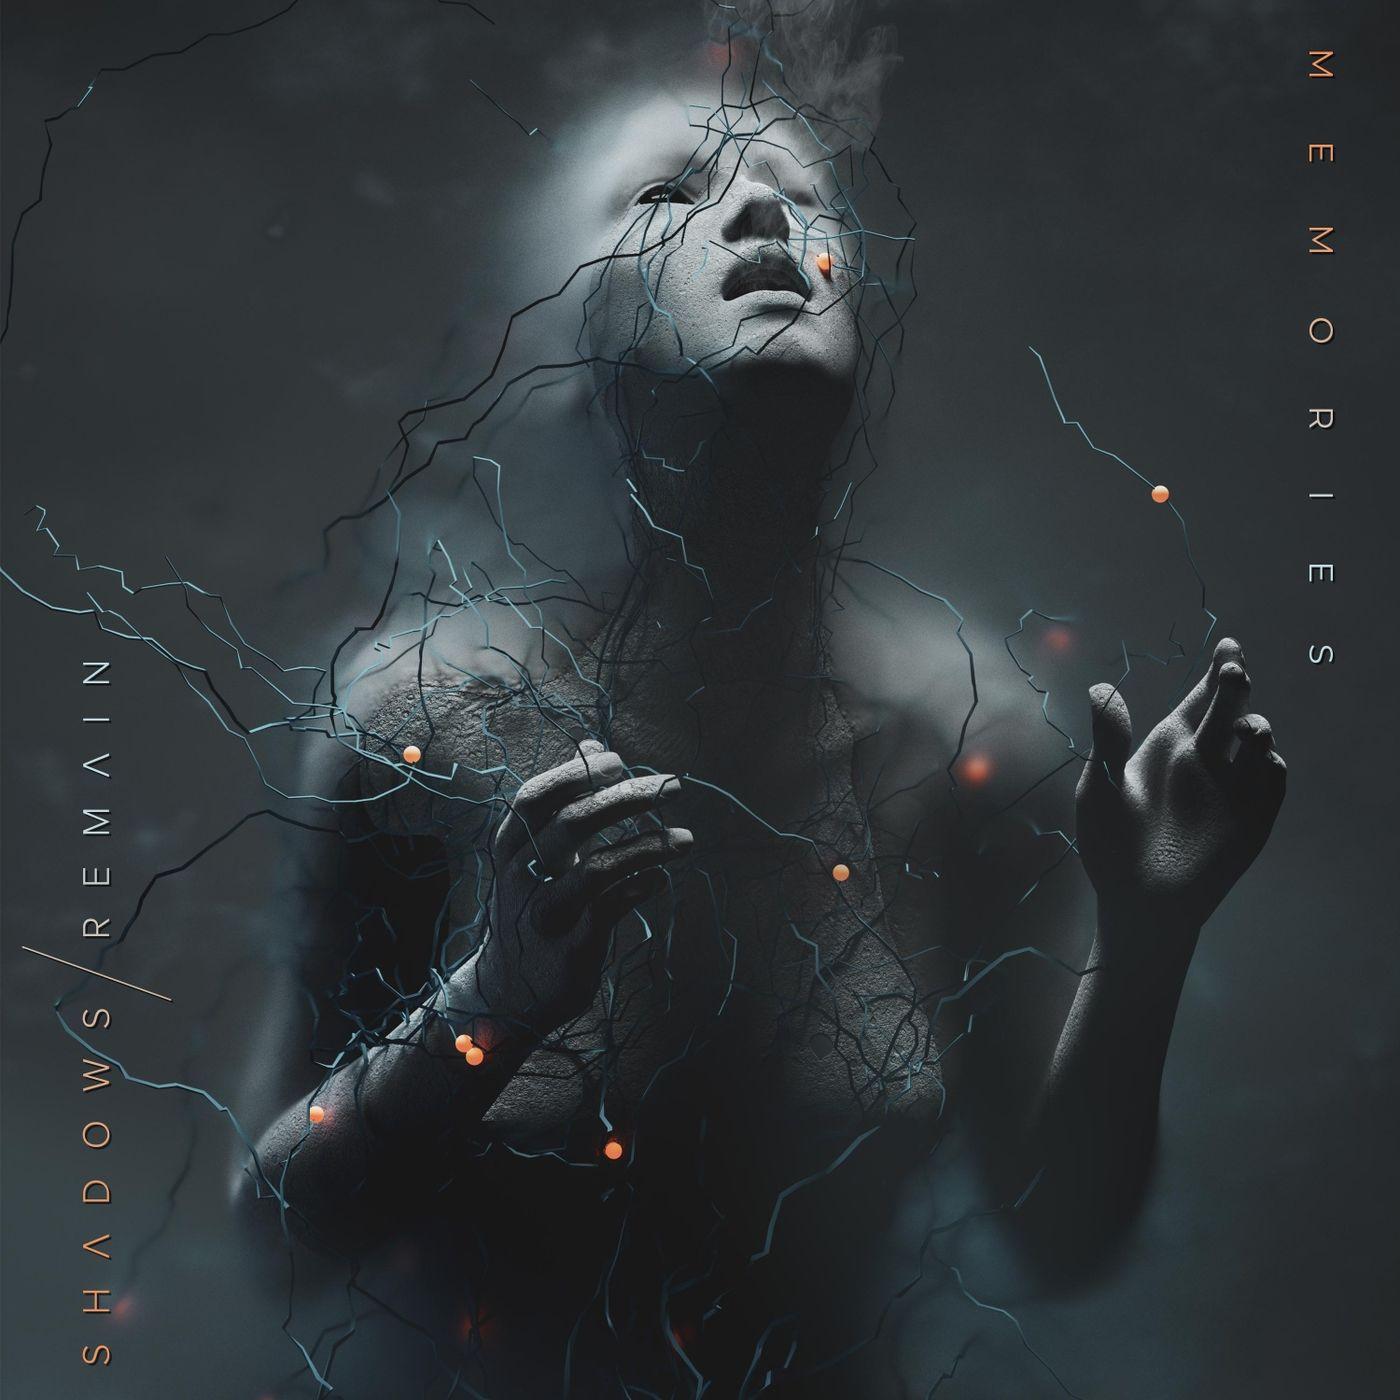 Shadows Remain - Memories [EP]